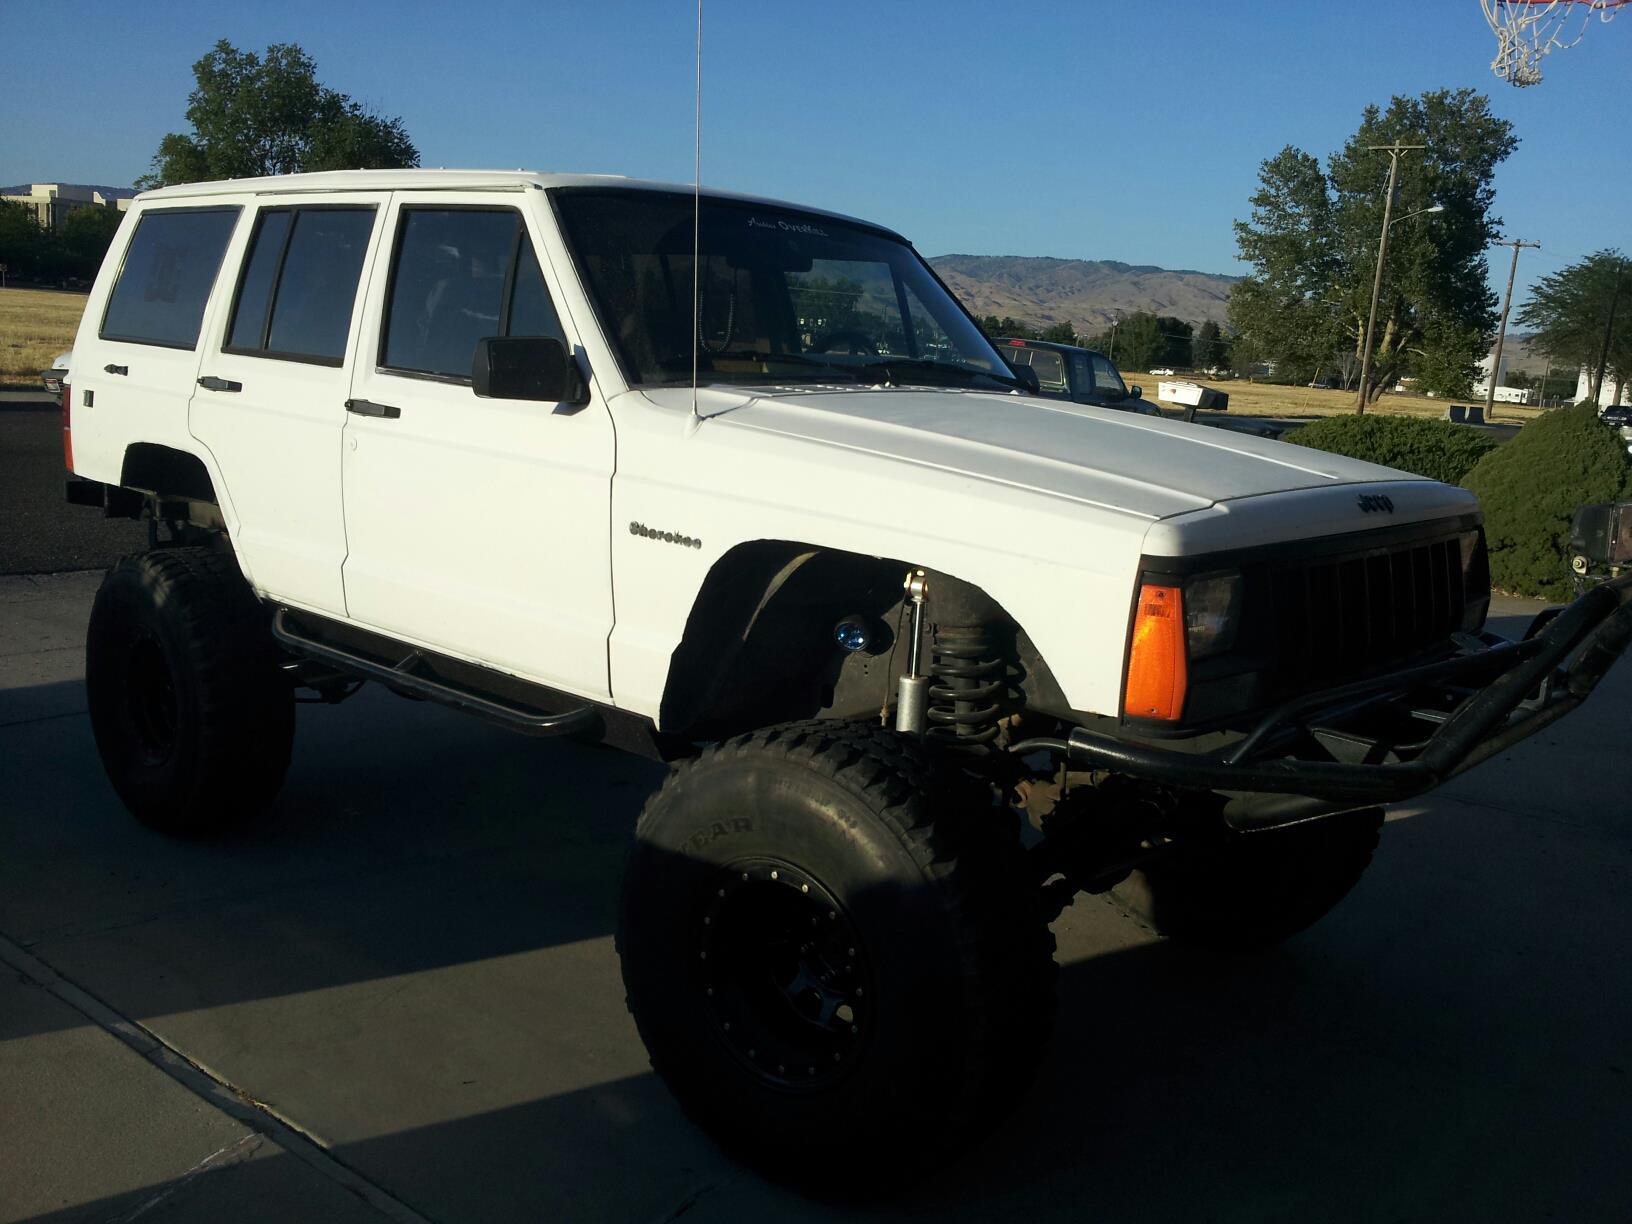 92-jeep-cherokee.jpg